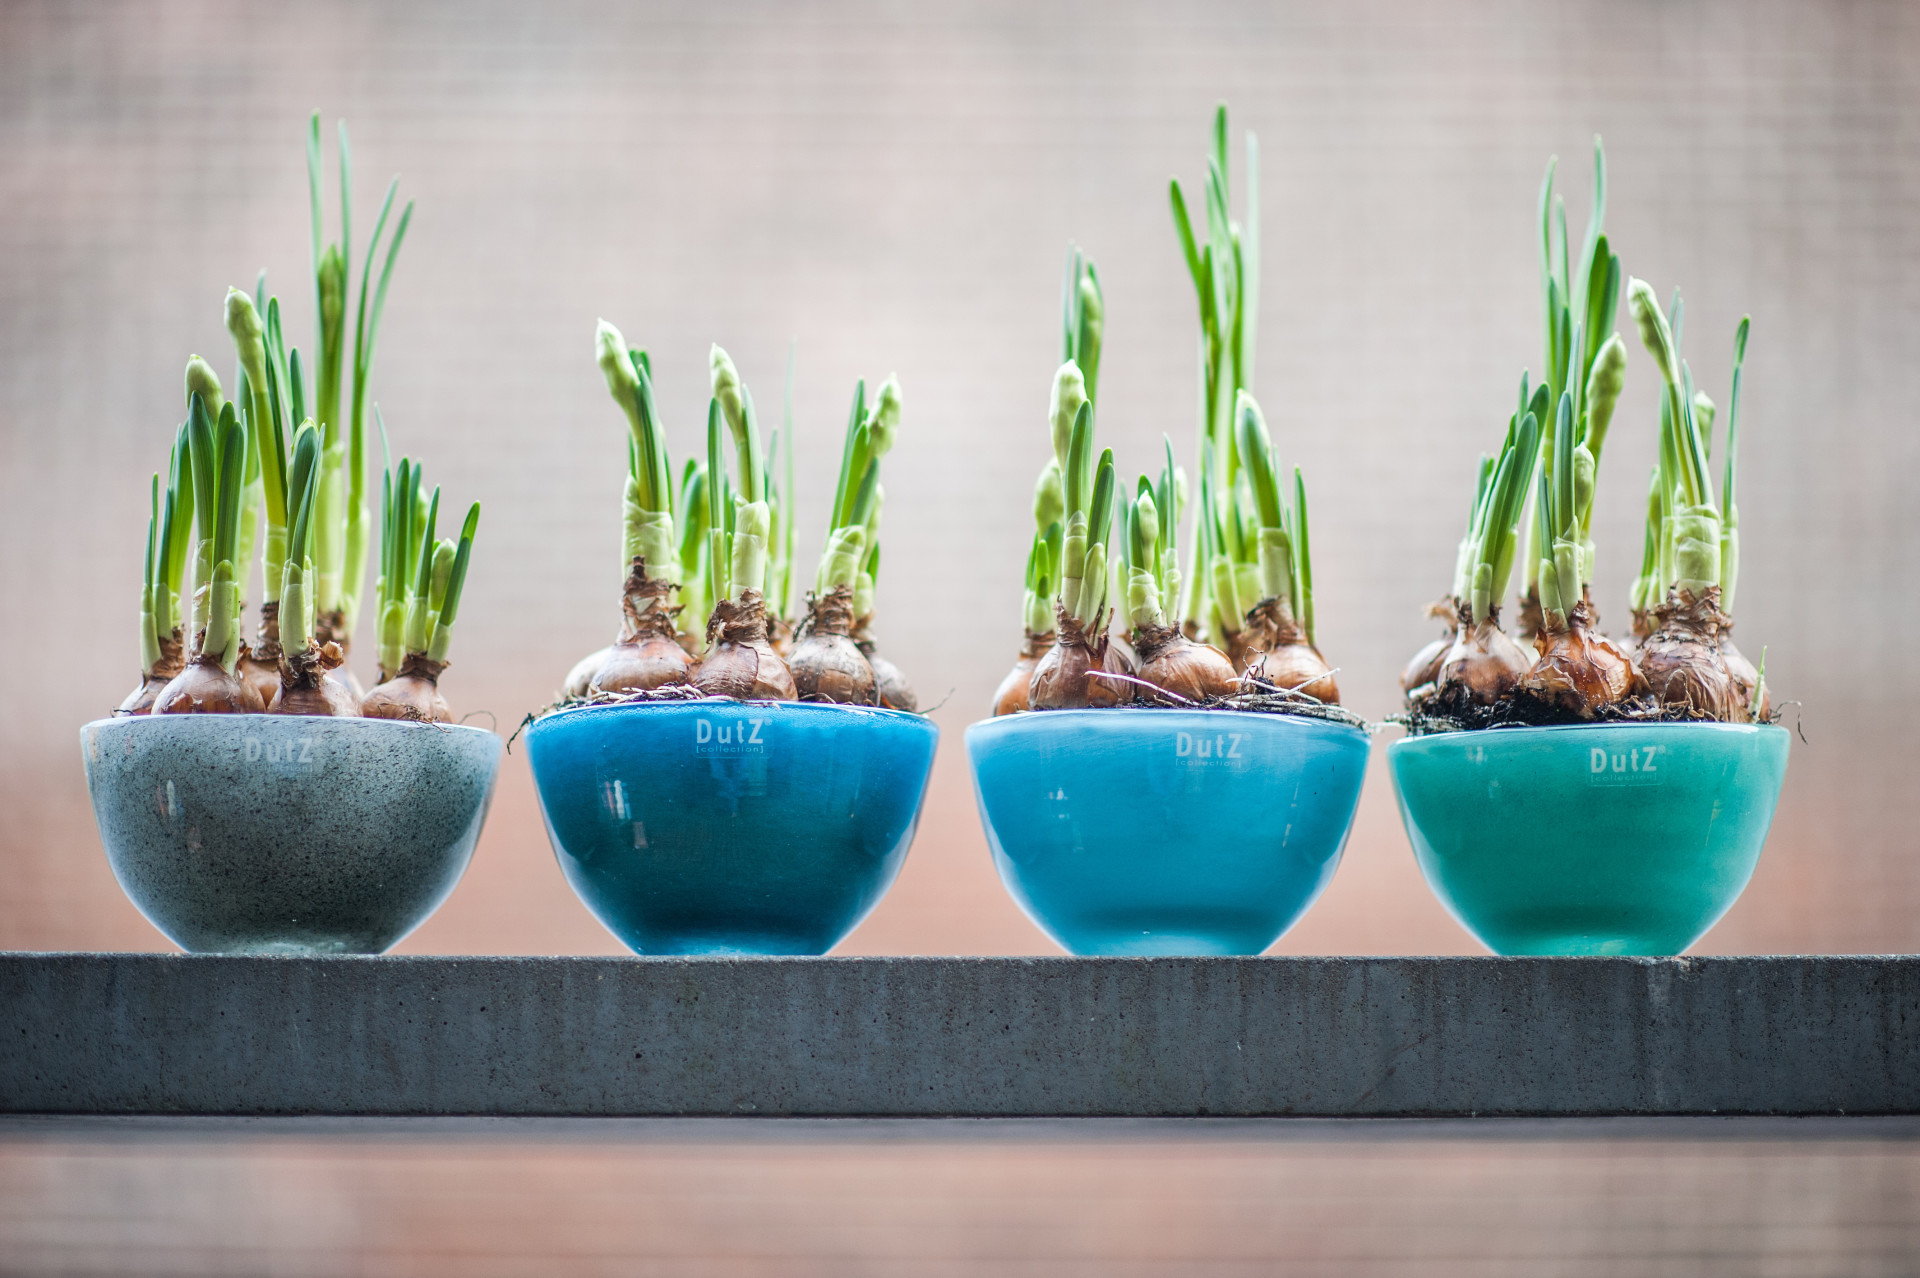 dutz glas collection kaufen bei home garden hannover home garden. Black Bedroom Furniture Sets. Home Design Ideas